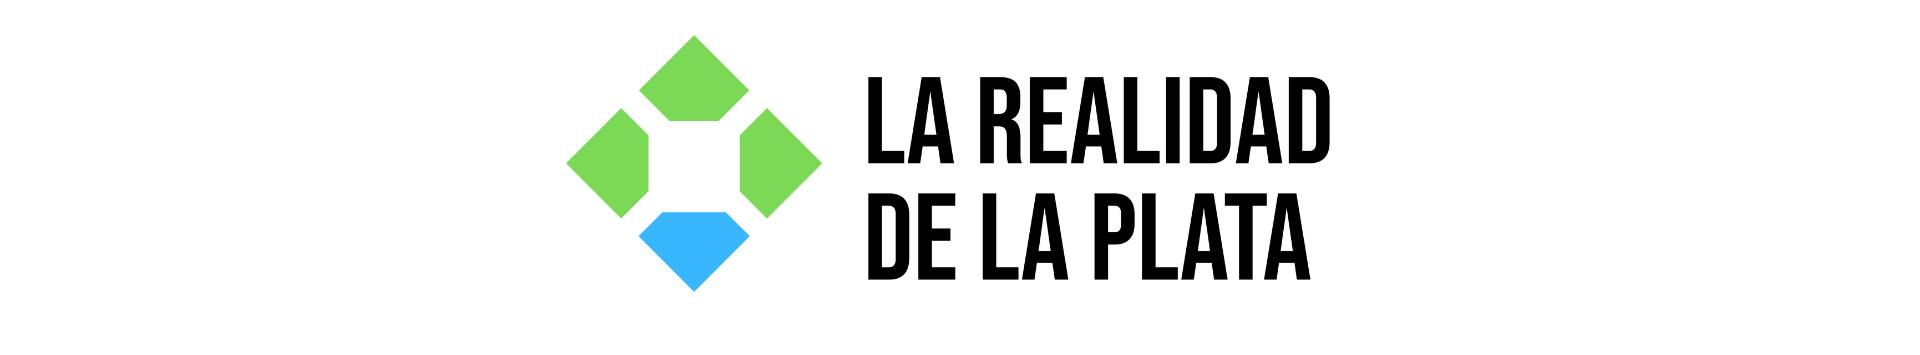 La Realidad de La Plata